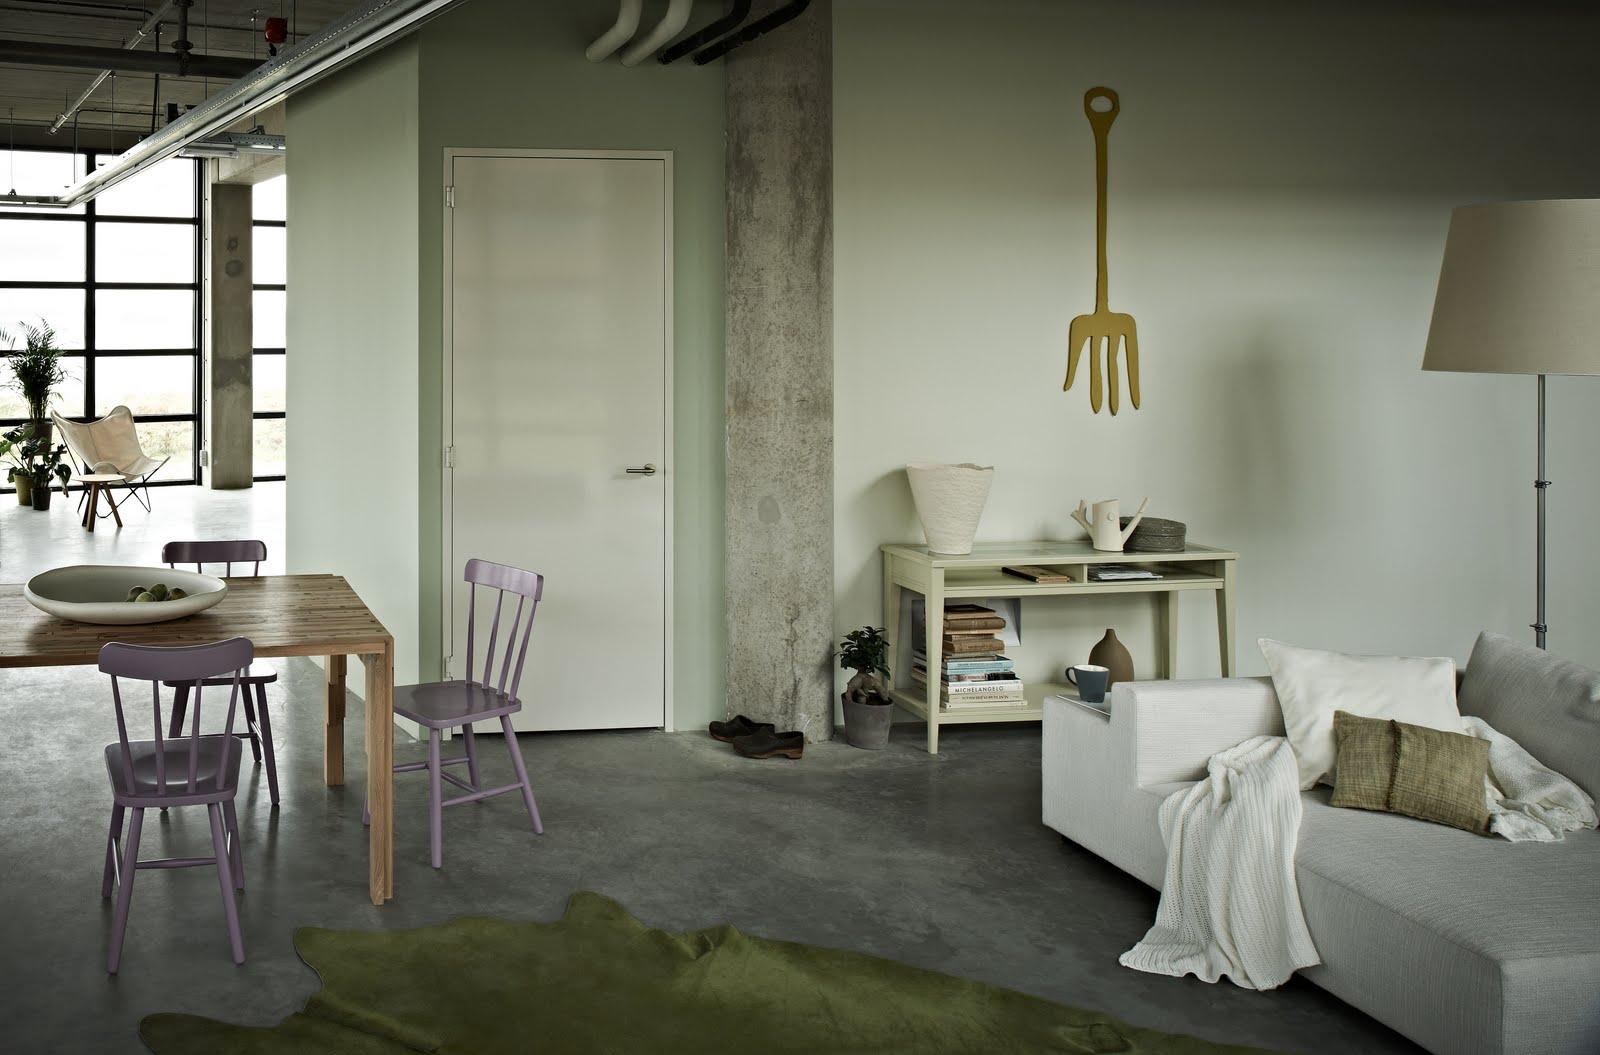 Woonkamer groen grijs: groene accessoires woonkamer interieur insider.